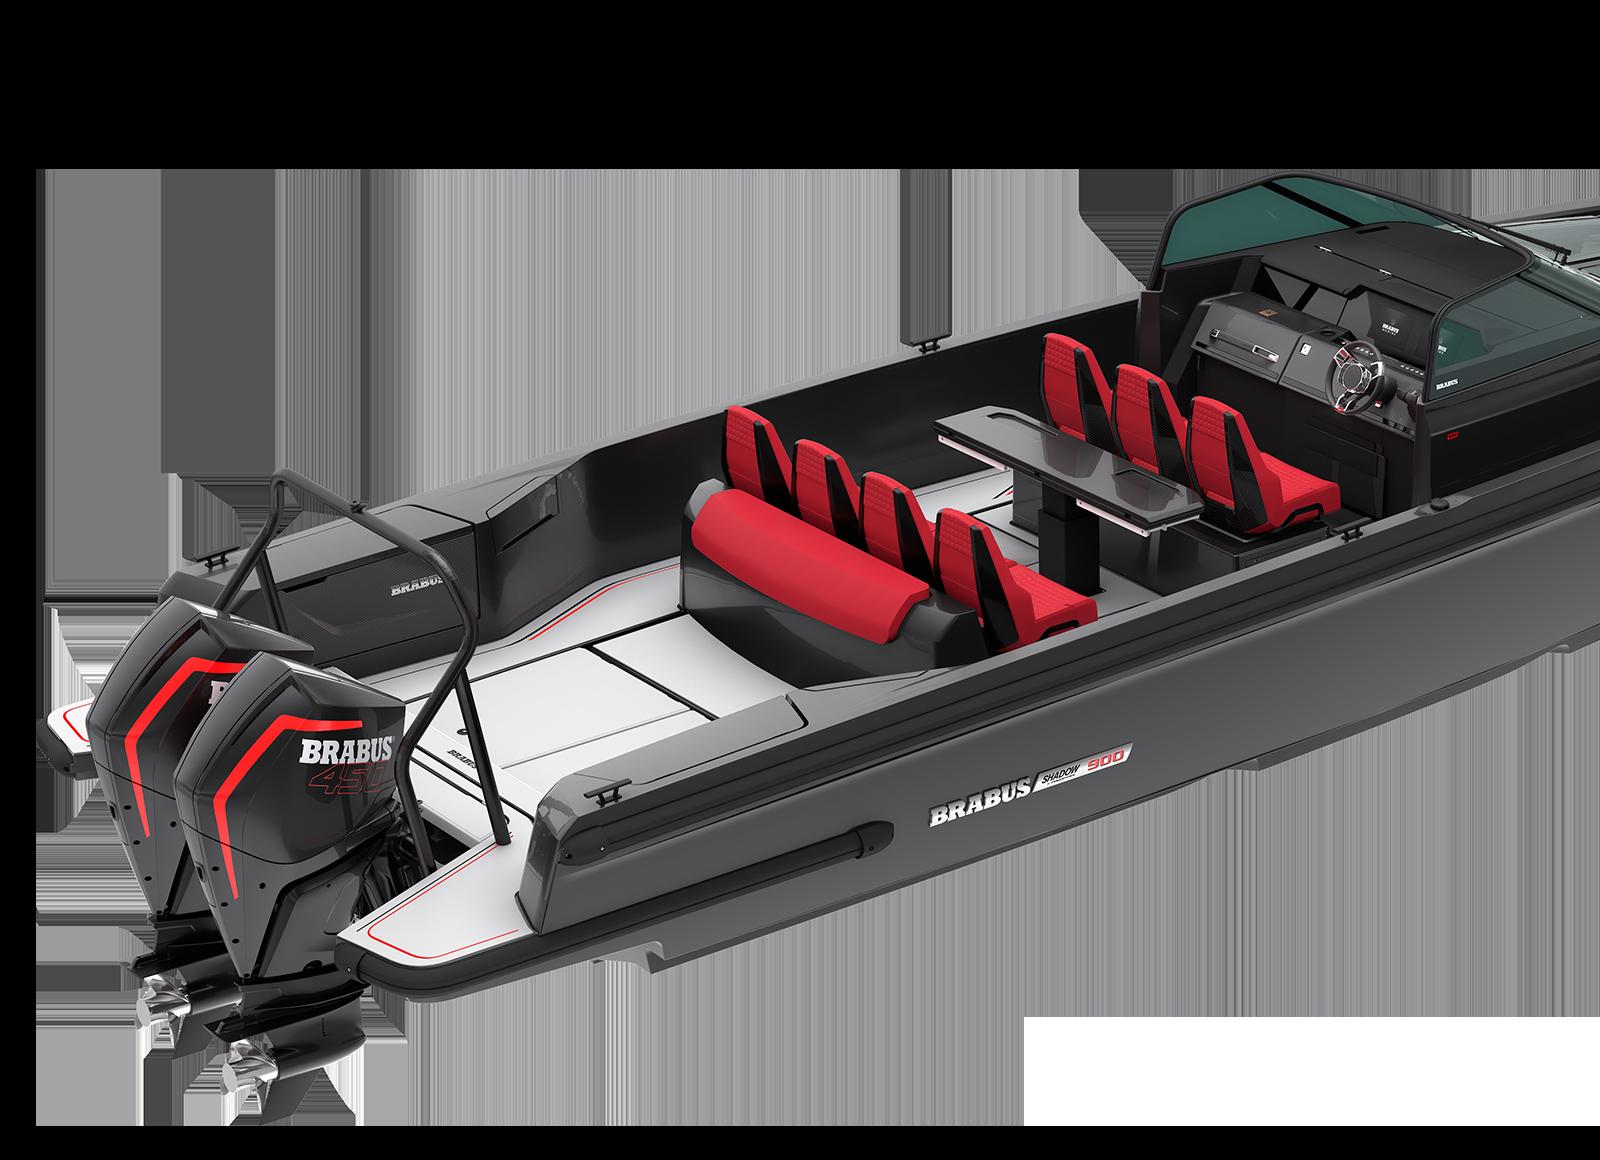 Brabus Shadow 900 Limited Edition